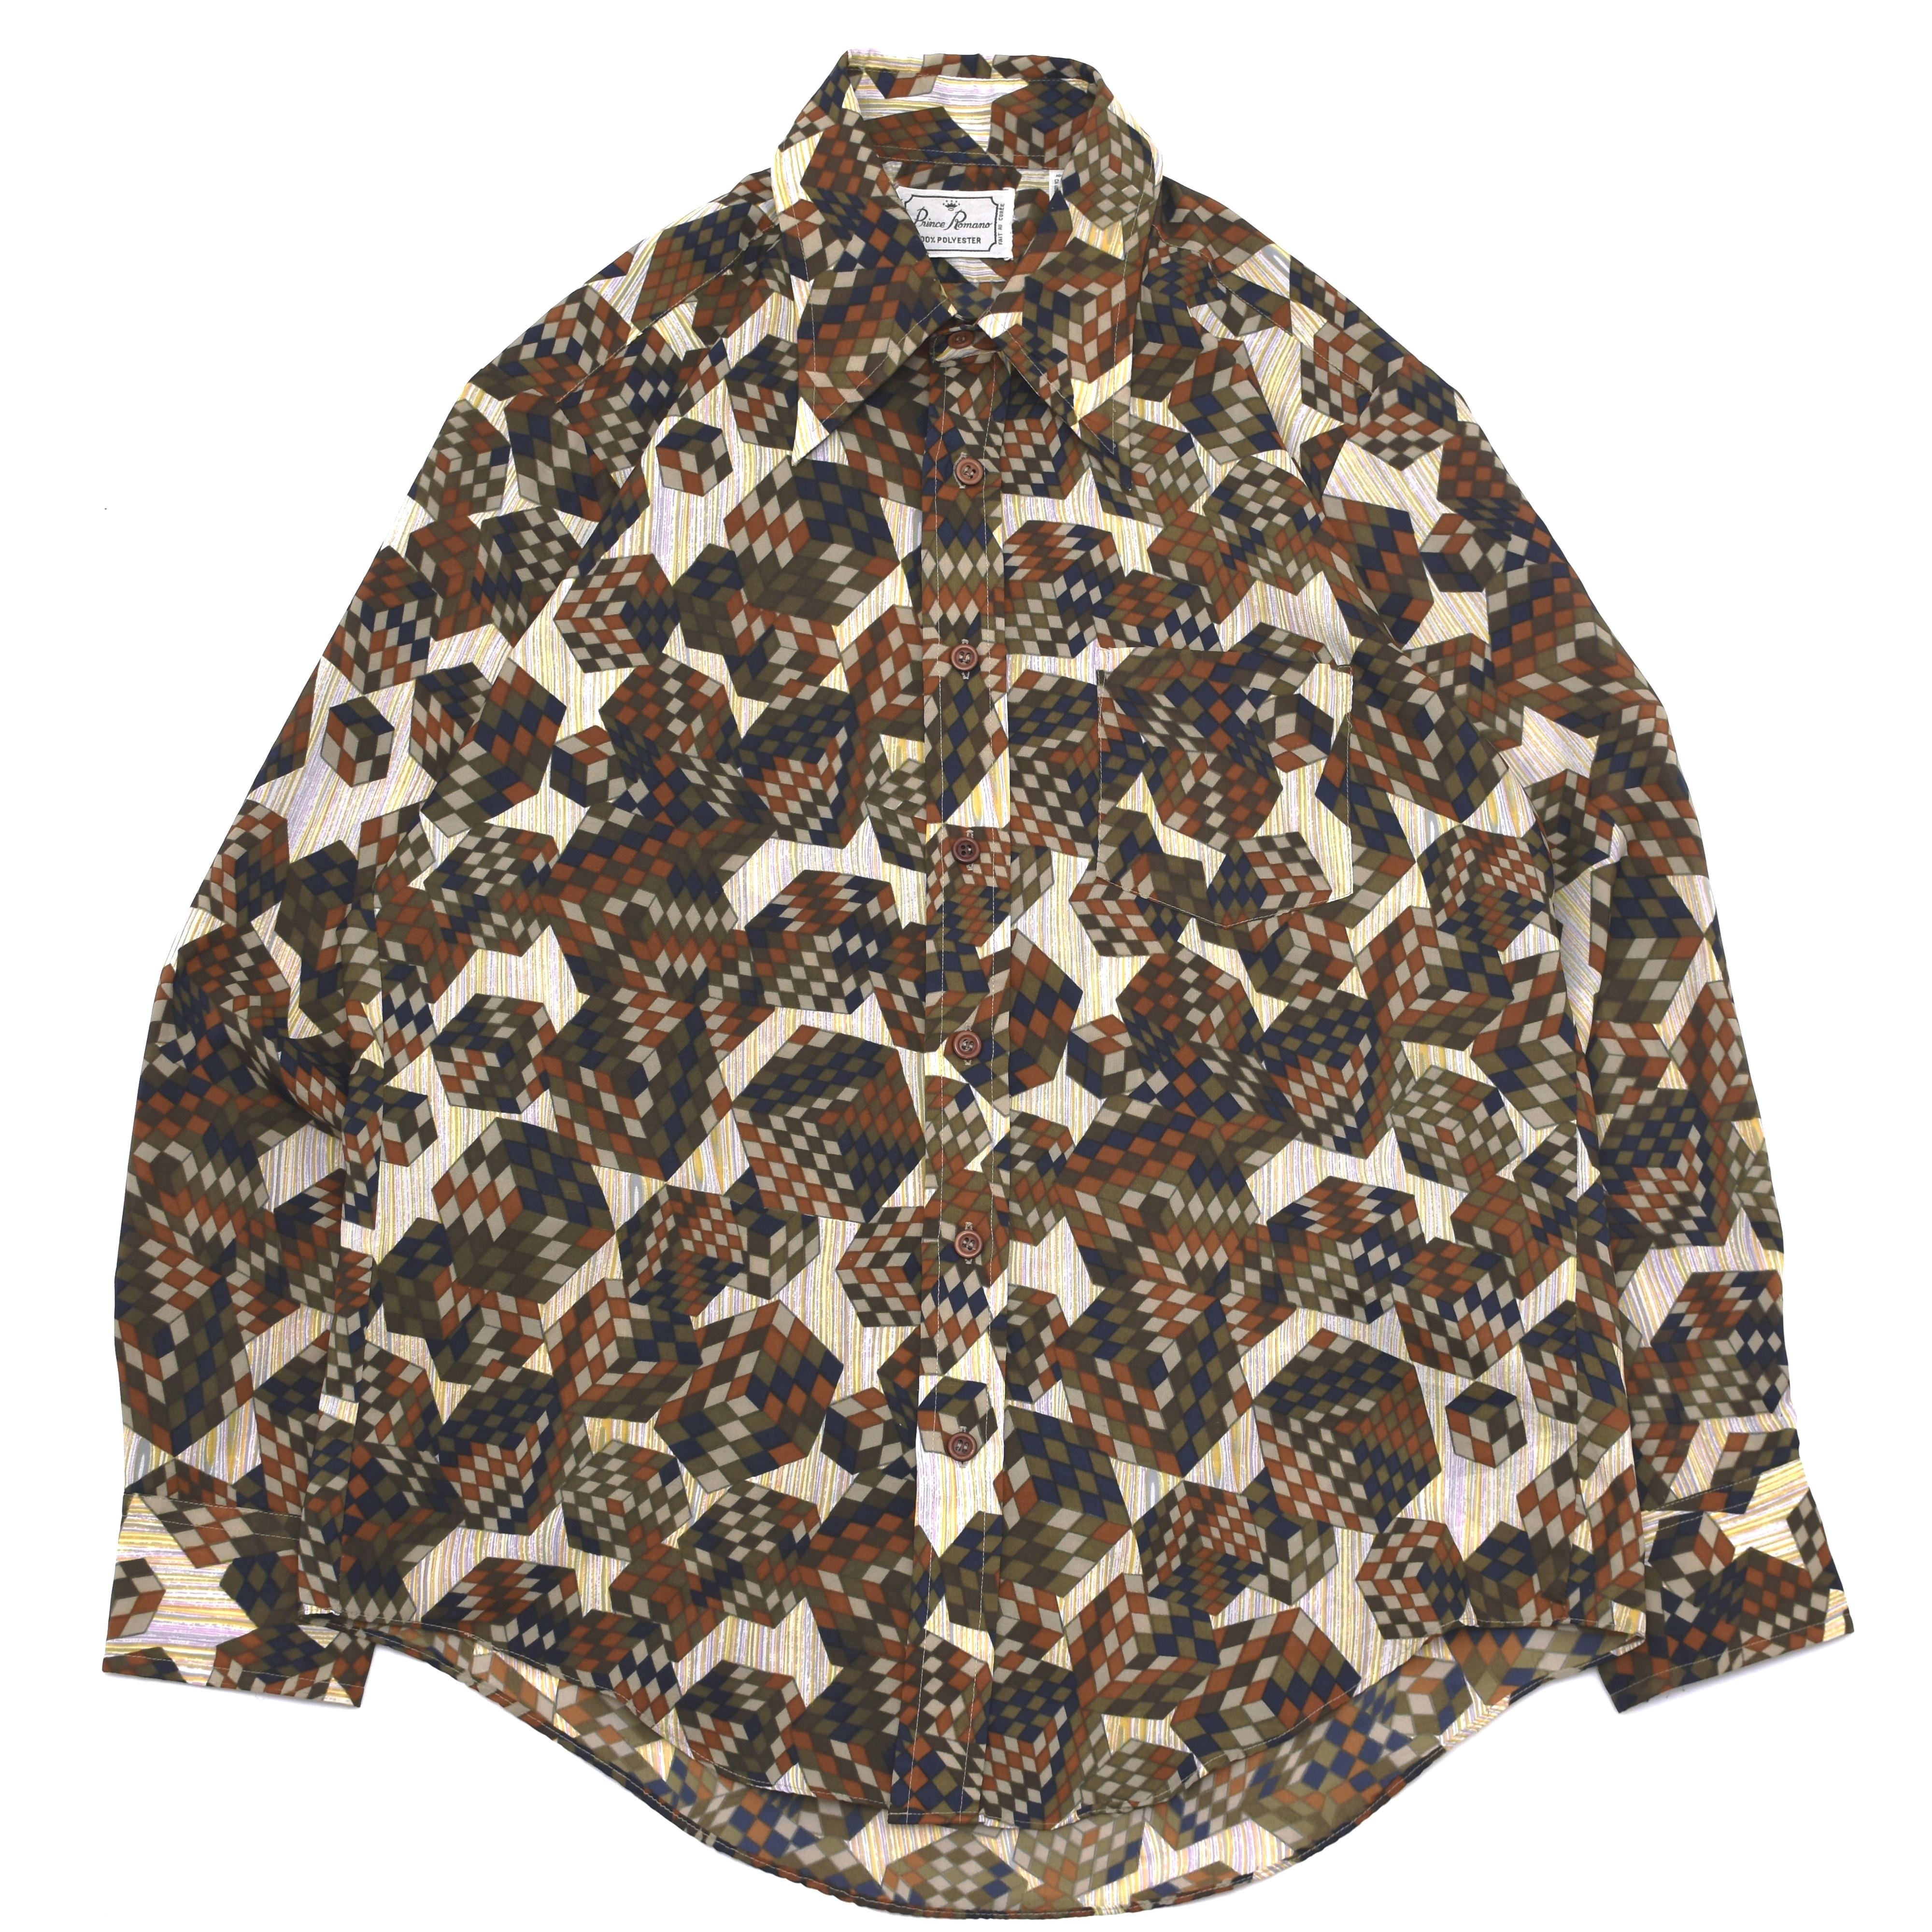 70s vintage geometric pattern poly shirt